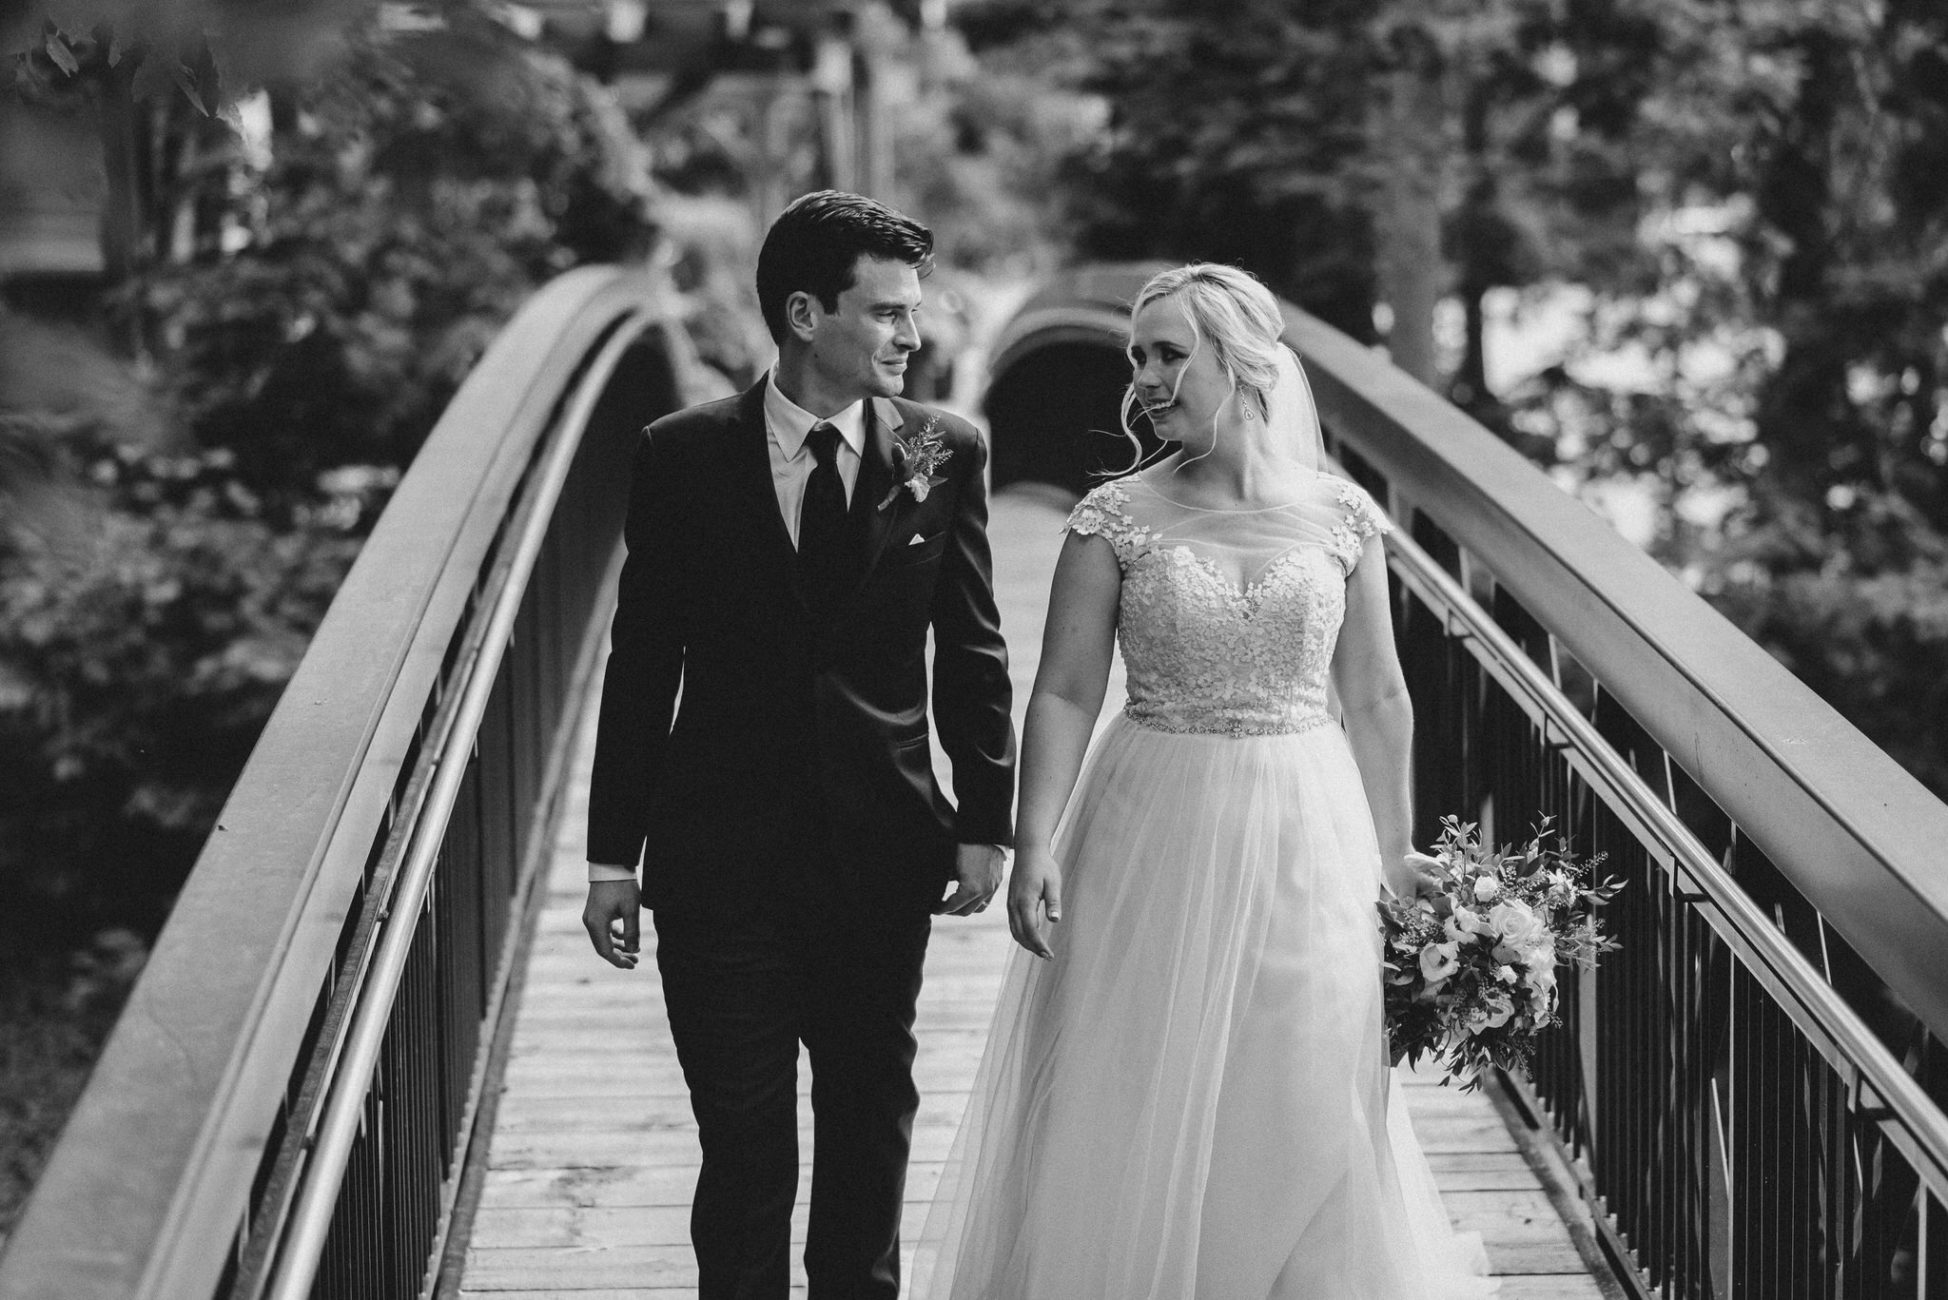 Ancaster Mill Wedding - bride and groom crossing bridge